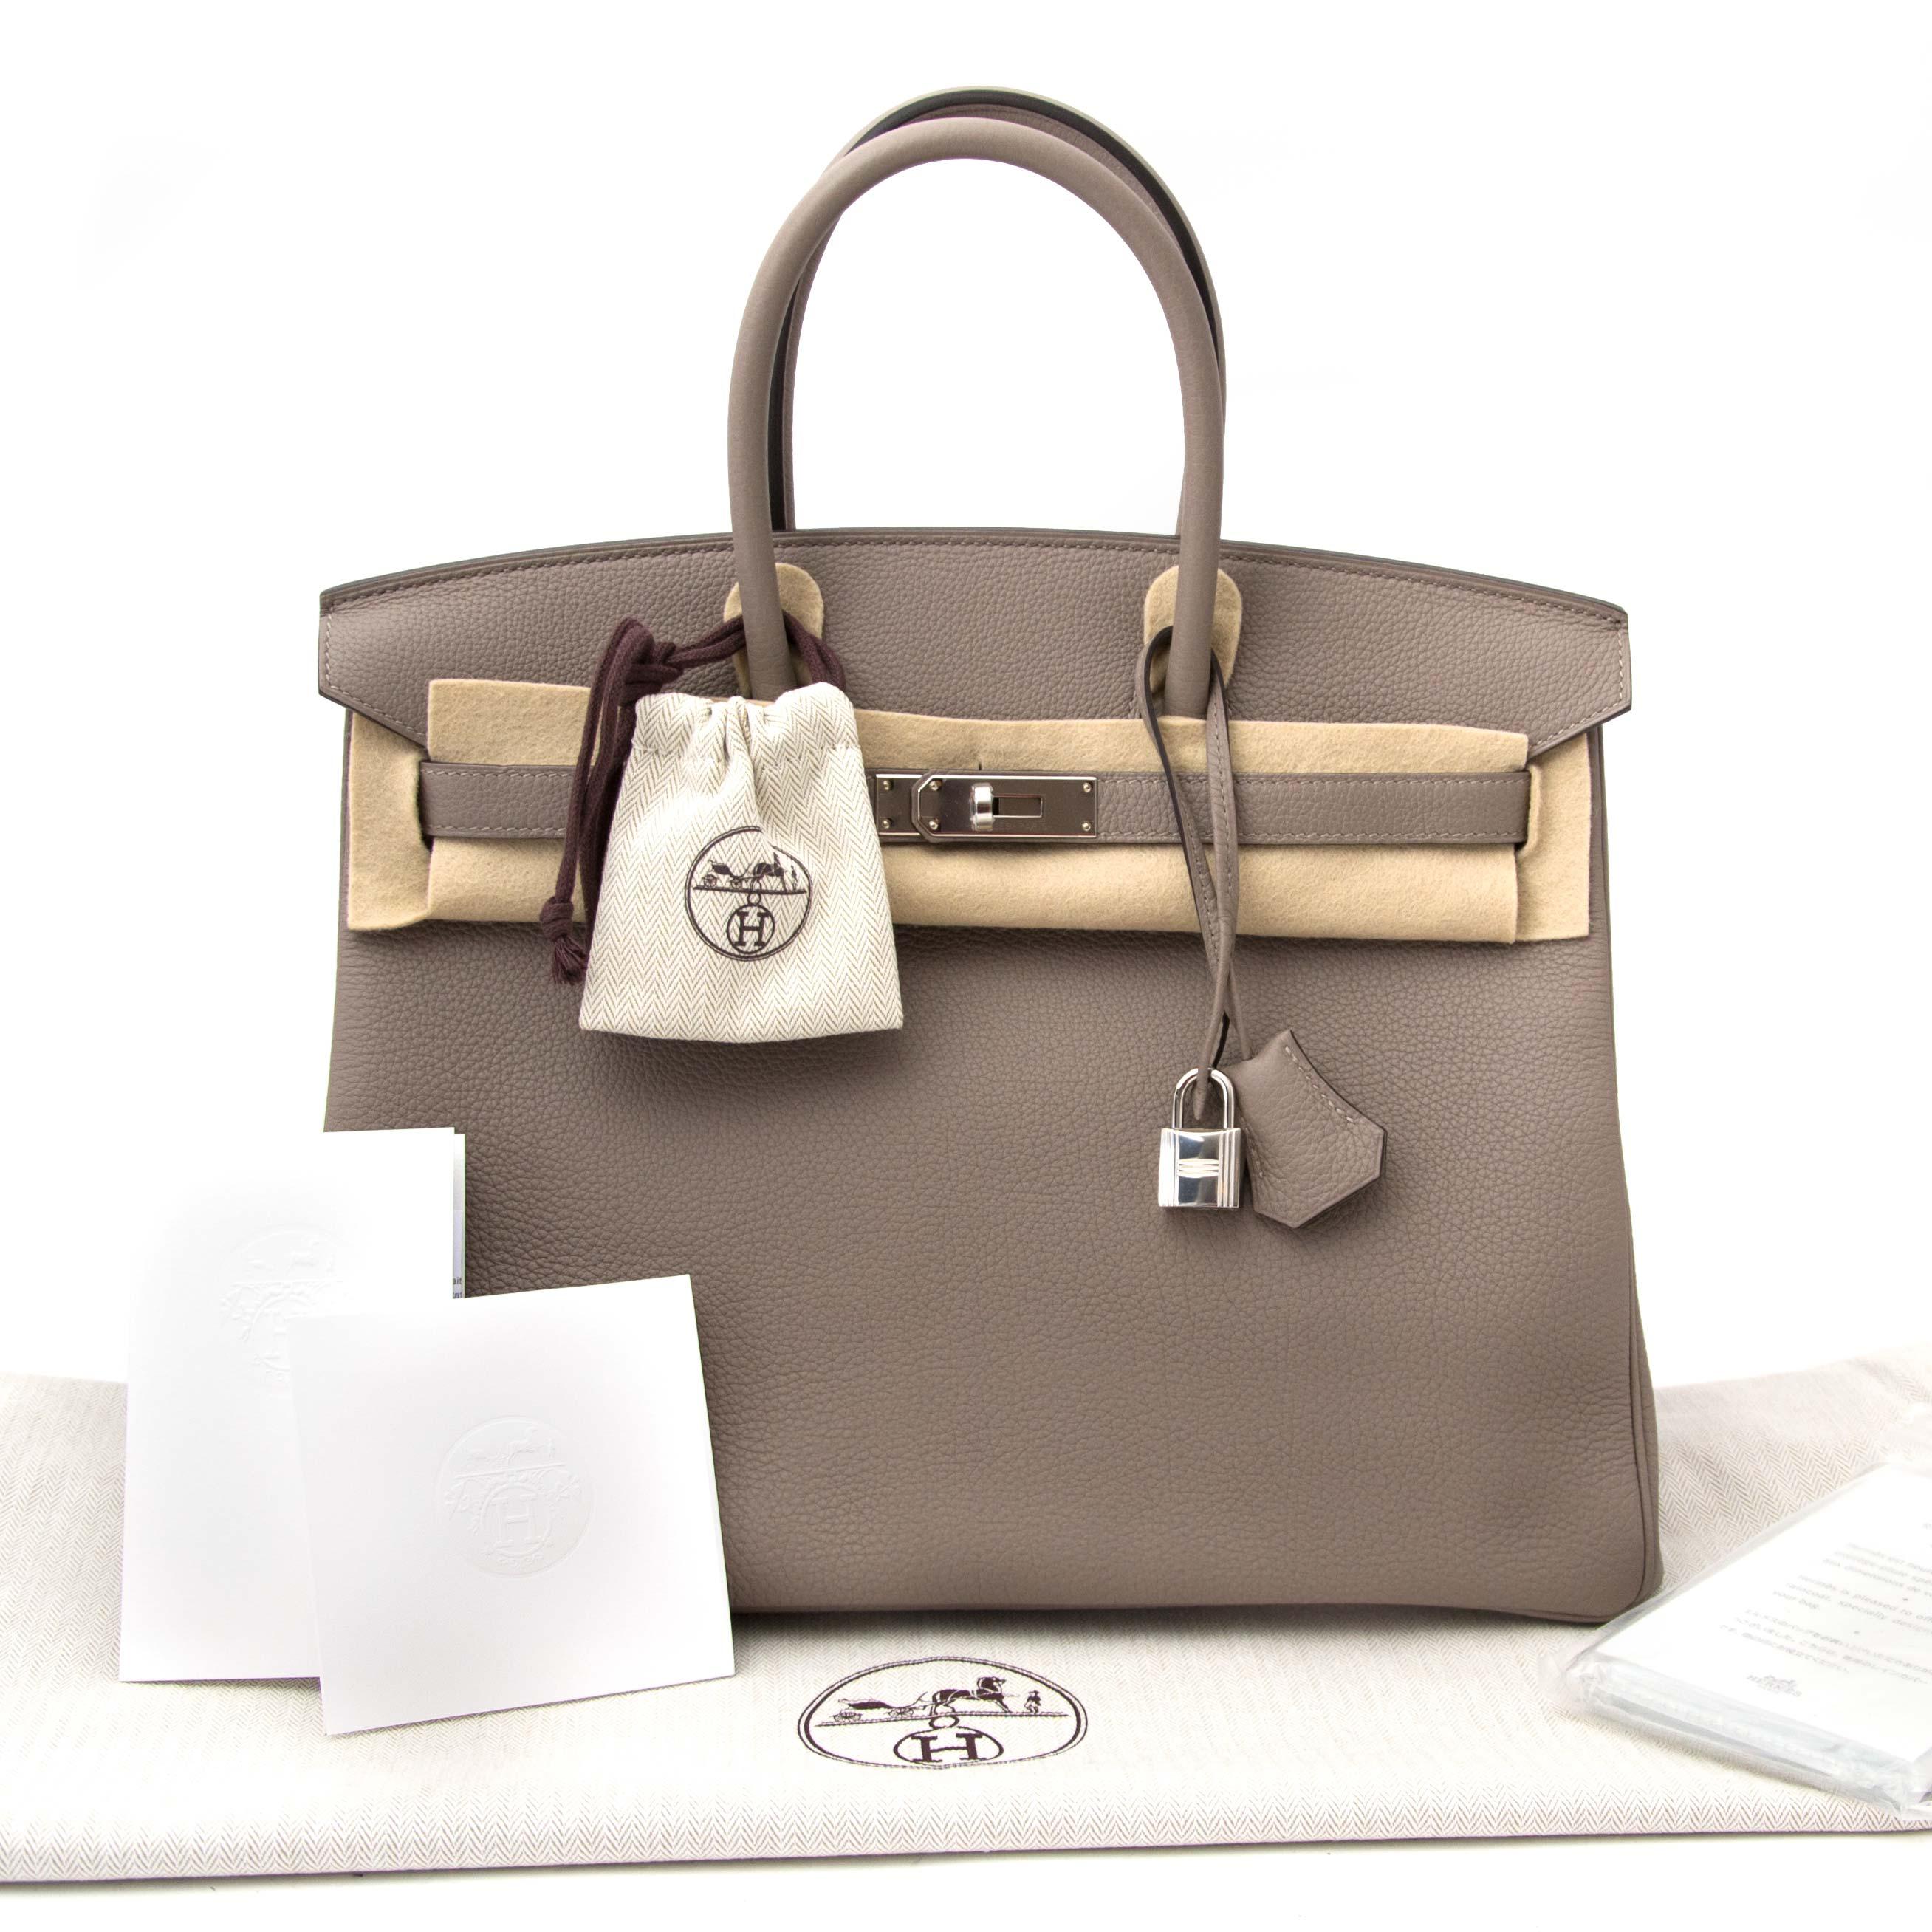 411dd13c0806 Hermès Birkin 35 Togo Gris Asphalte PHW For Sale at 1stdibs